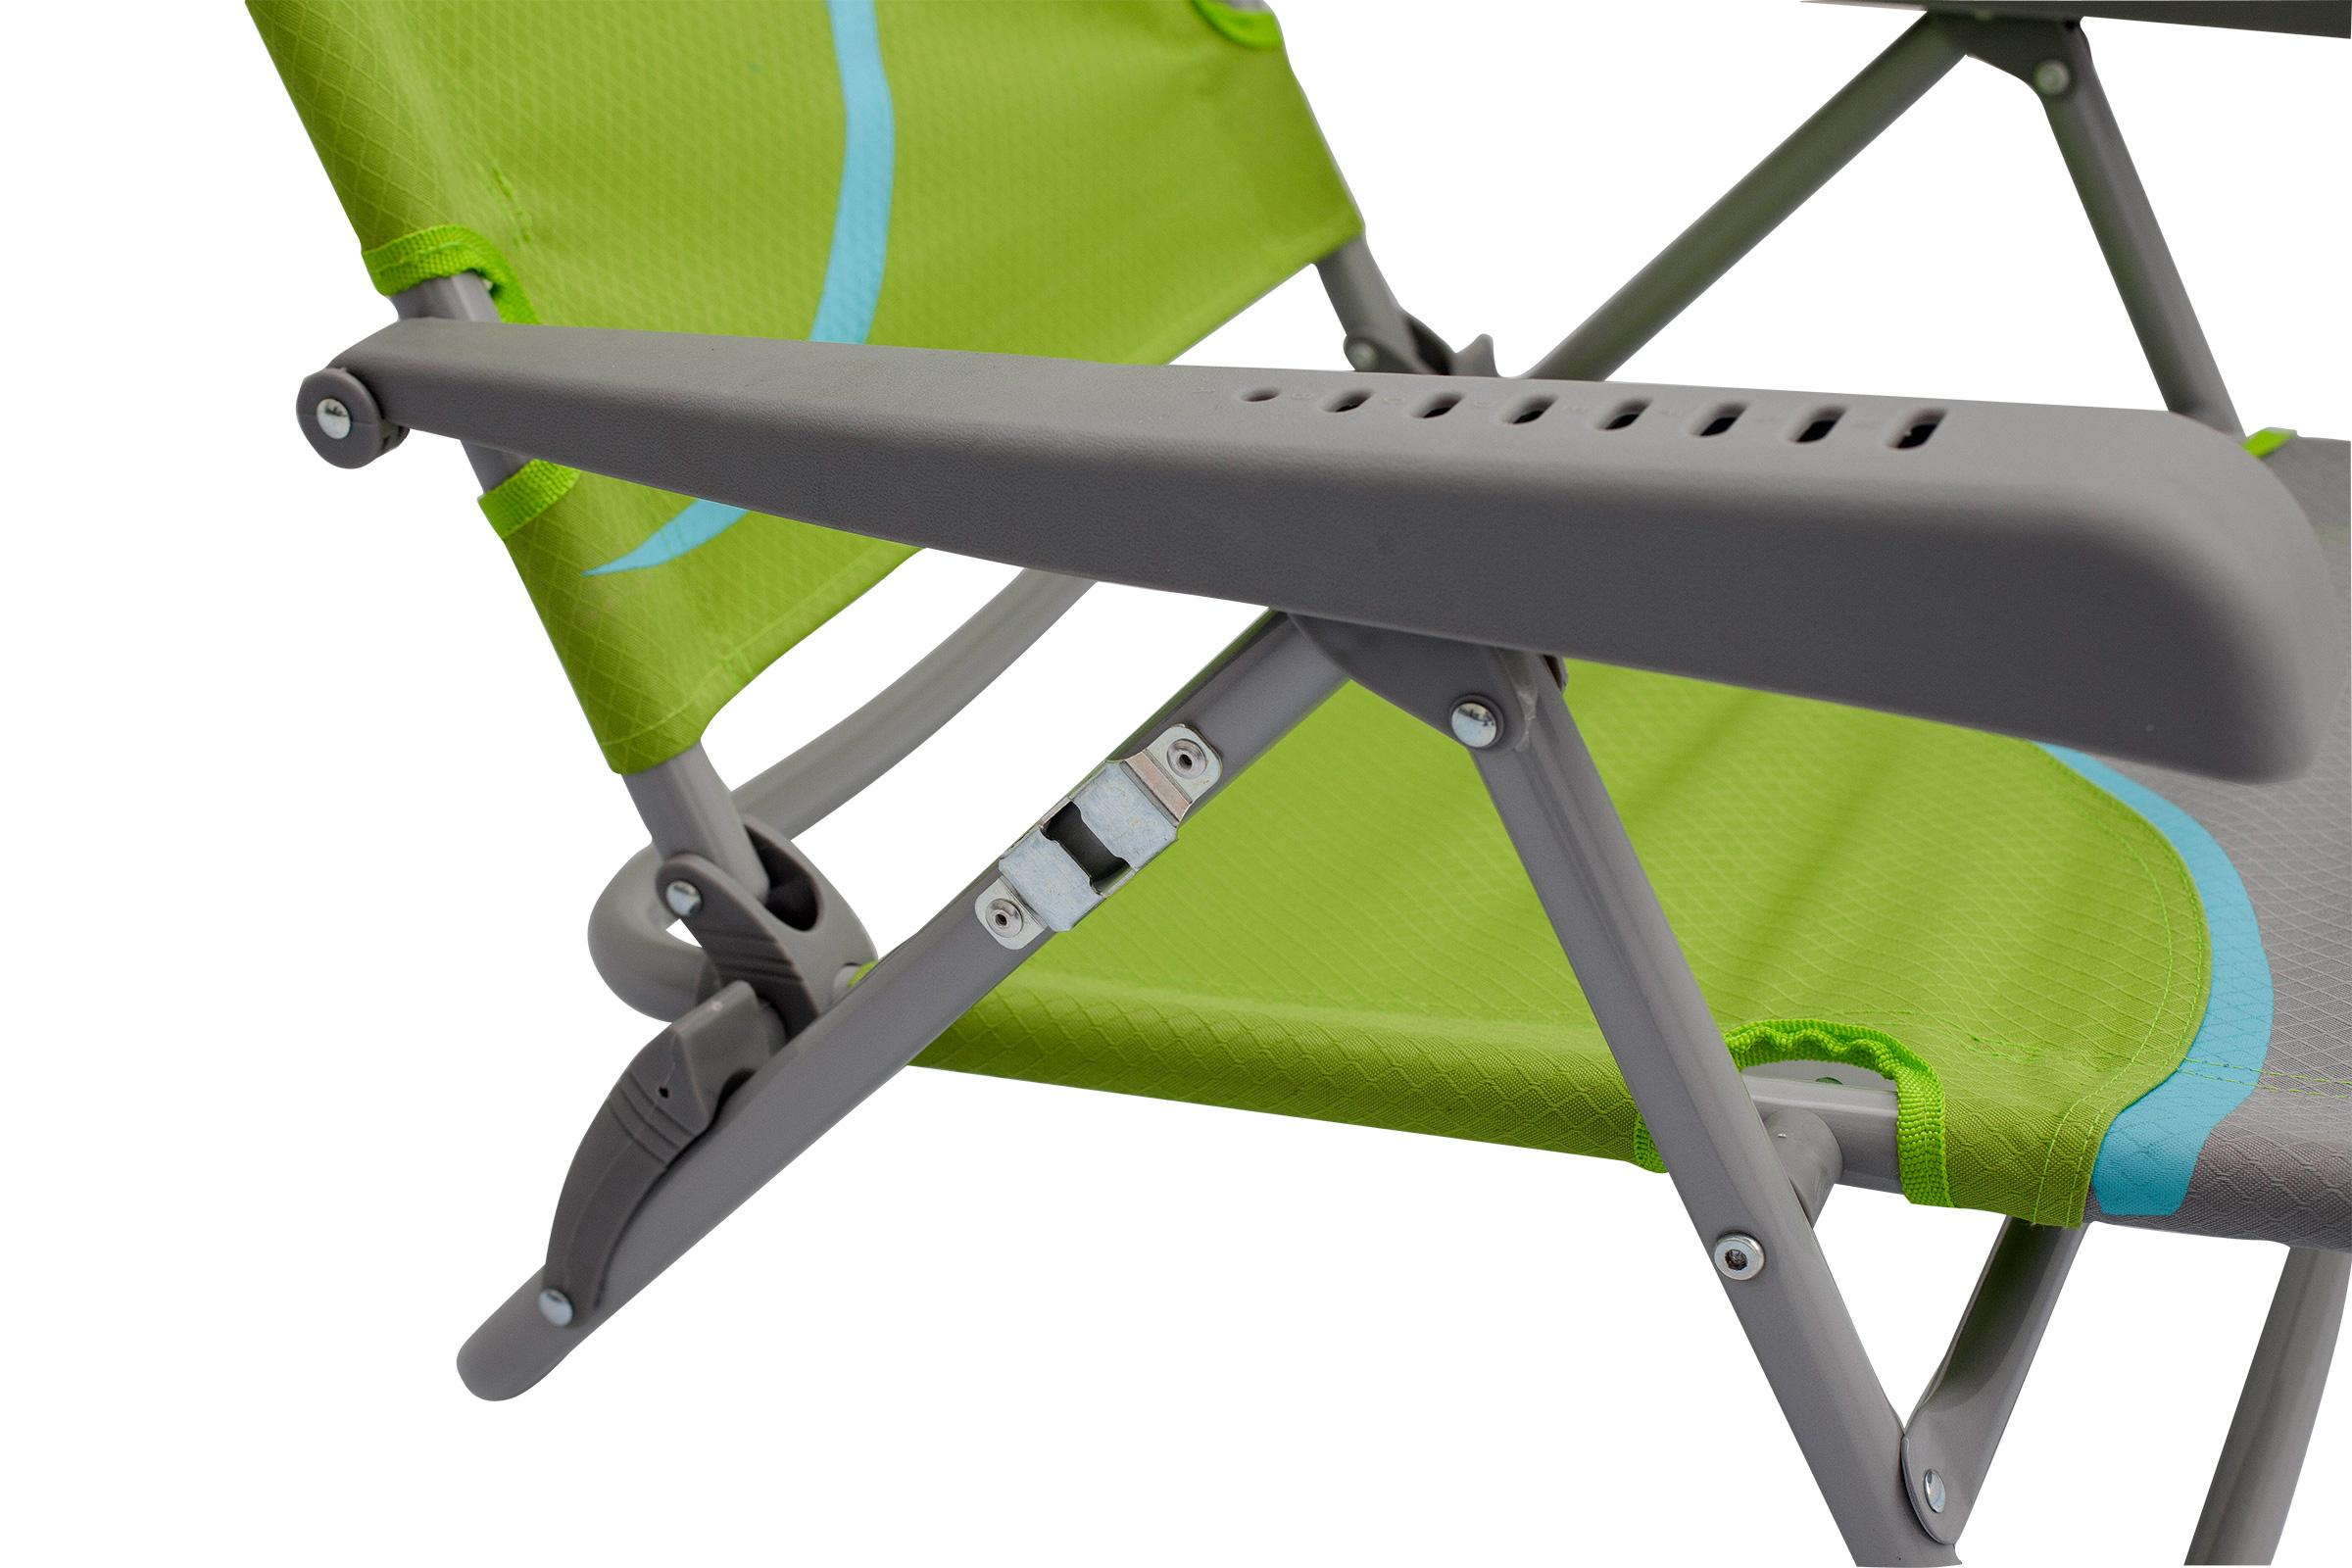 meerweh erwachsene strandstuhl mit verstellbarer. Black Bedroom Furniture Sets. Home Design Ideas